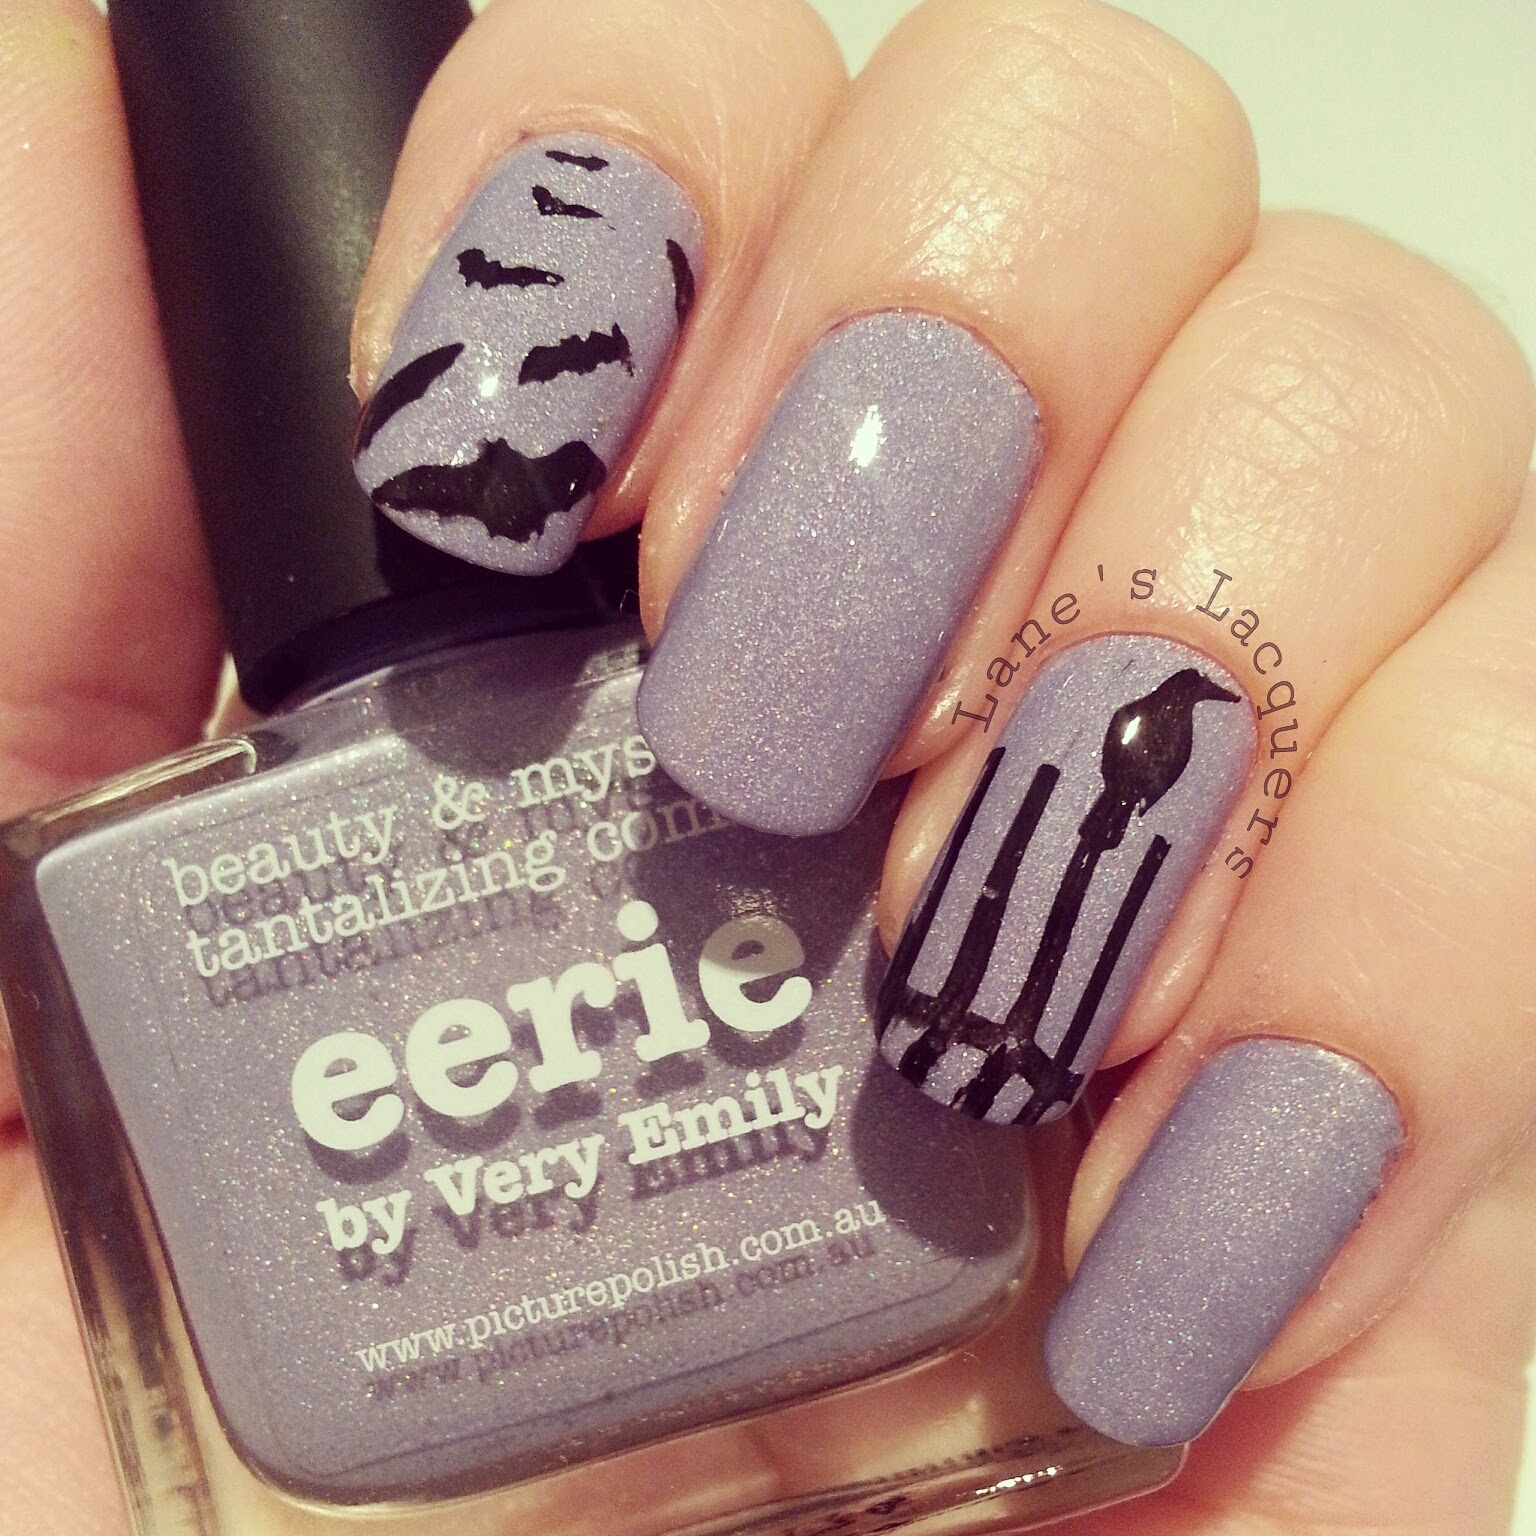 picture-polish-eerie-swatch-bats-birds-creepy-nails